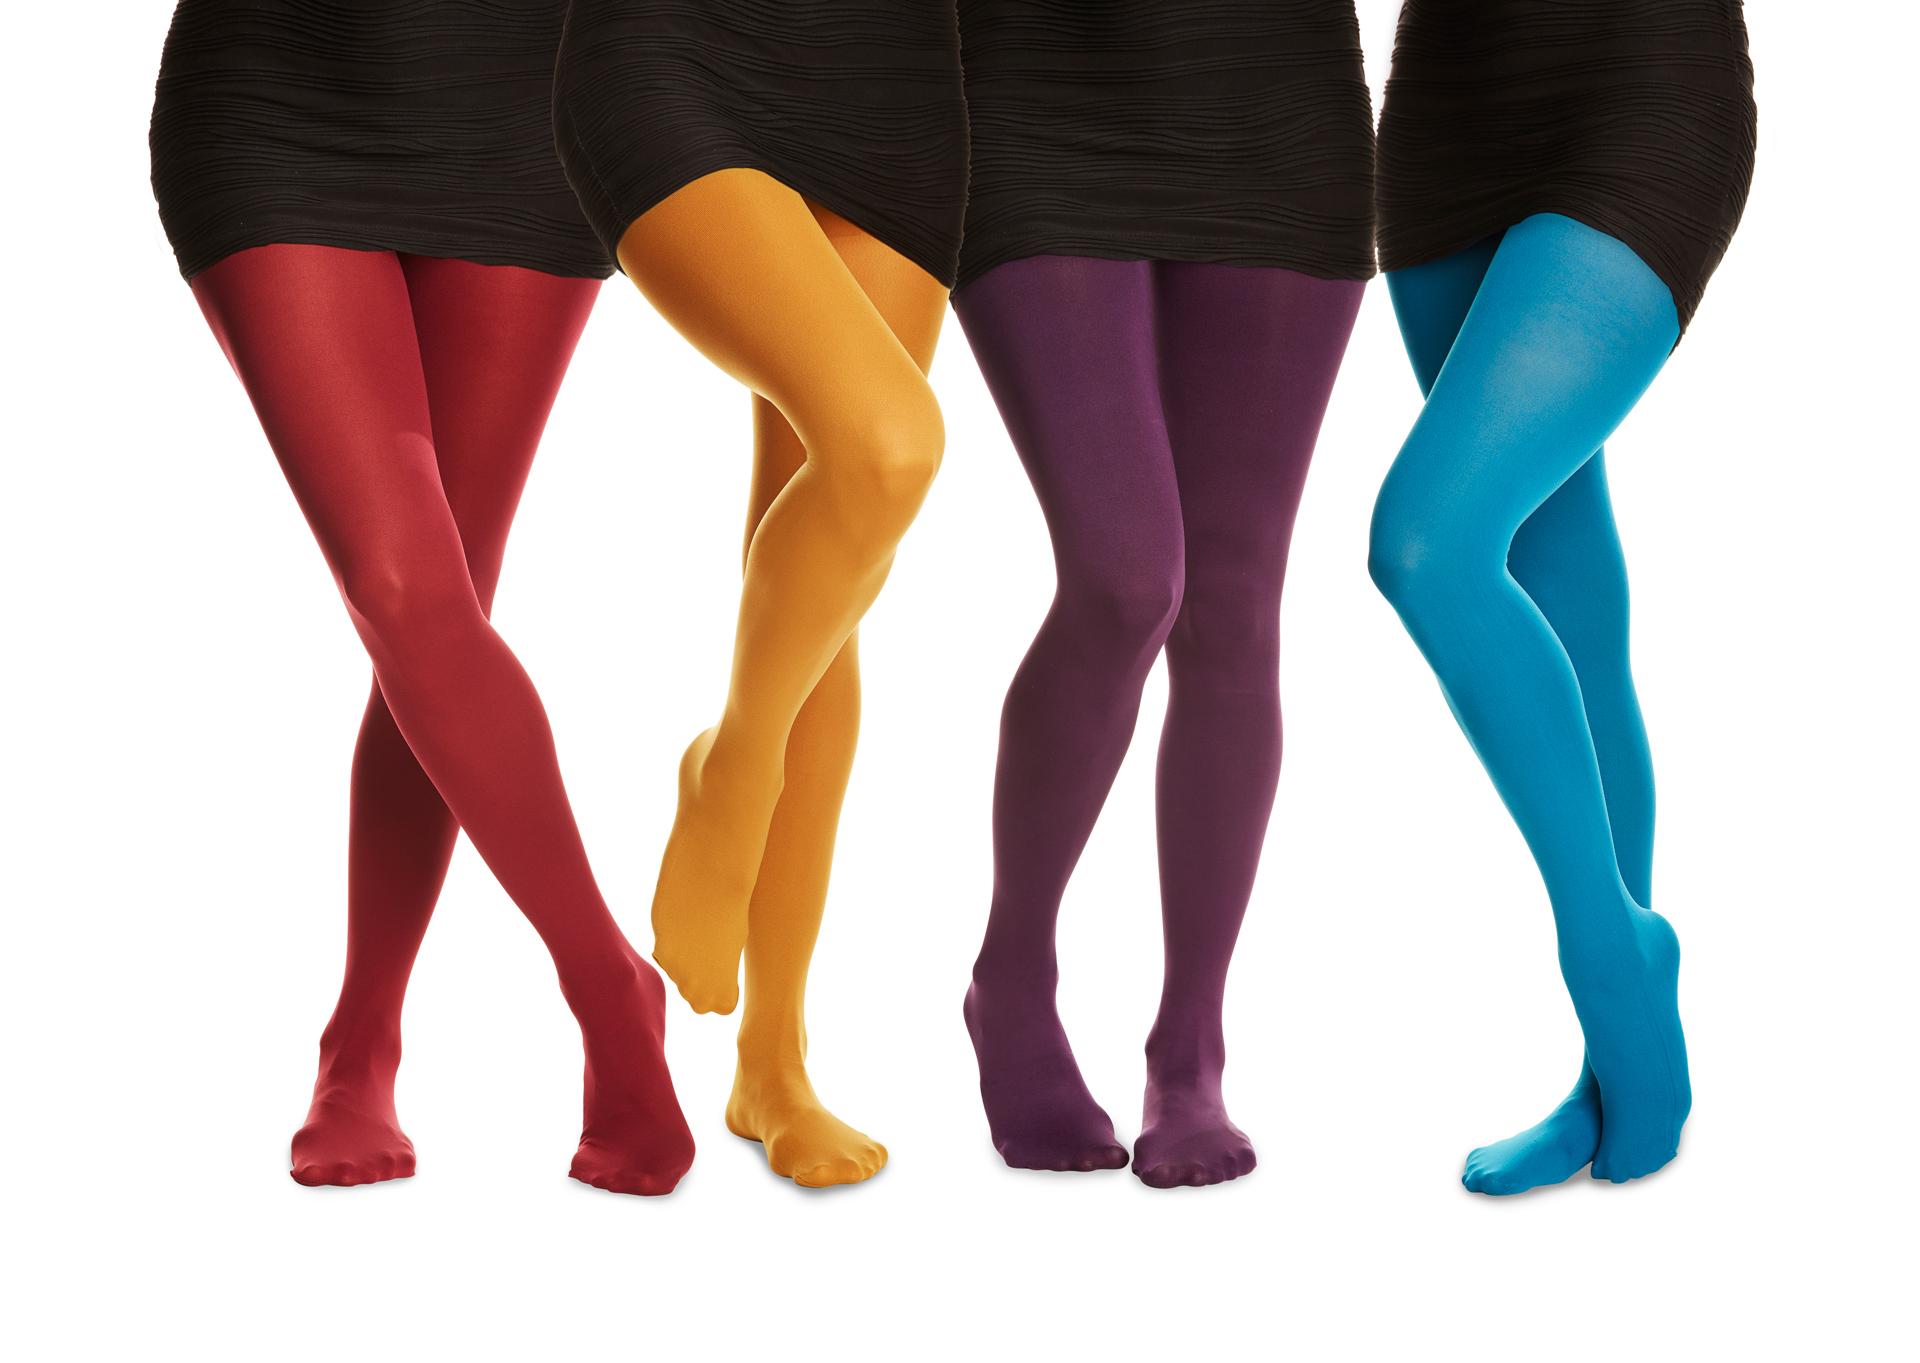 http://ghk.h-cdn.co/assets/cm/15/11/54ff3095346b8-ghk-best-tights-s2.jpg